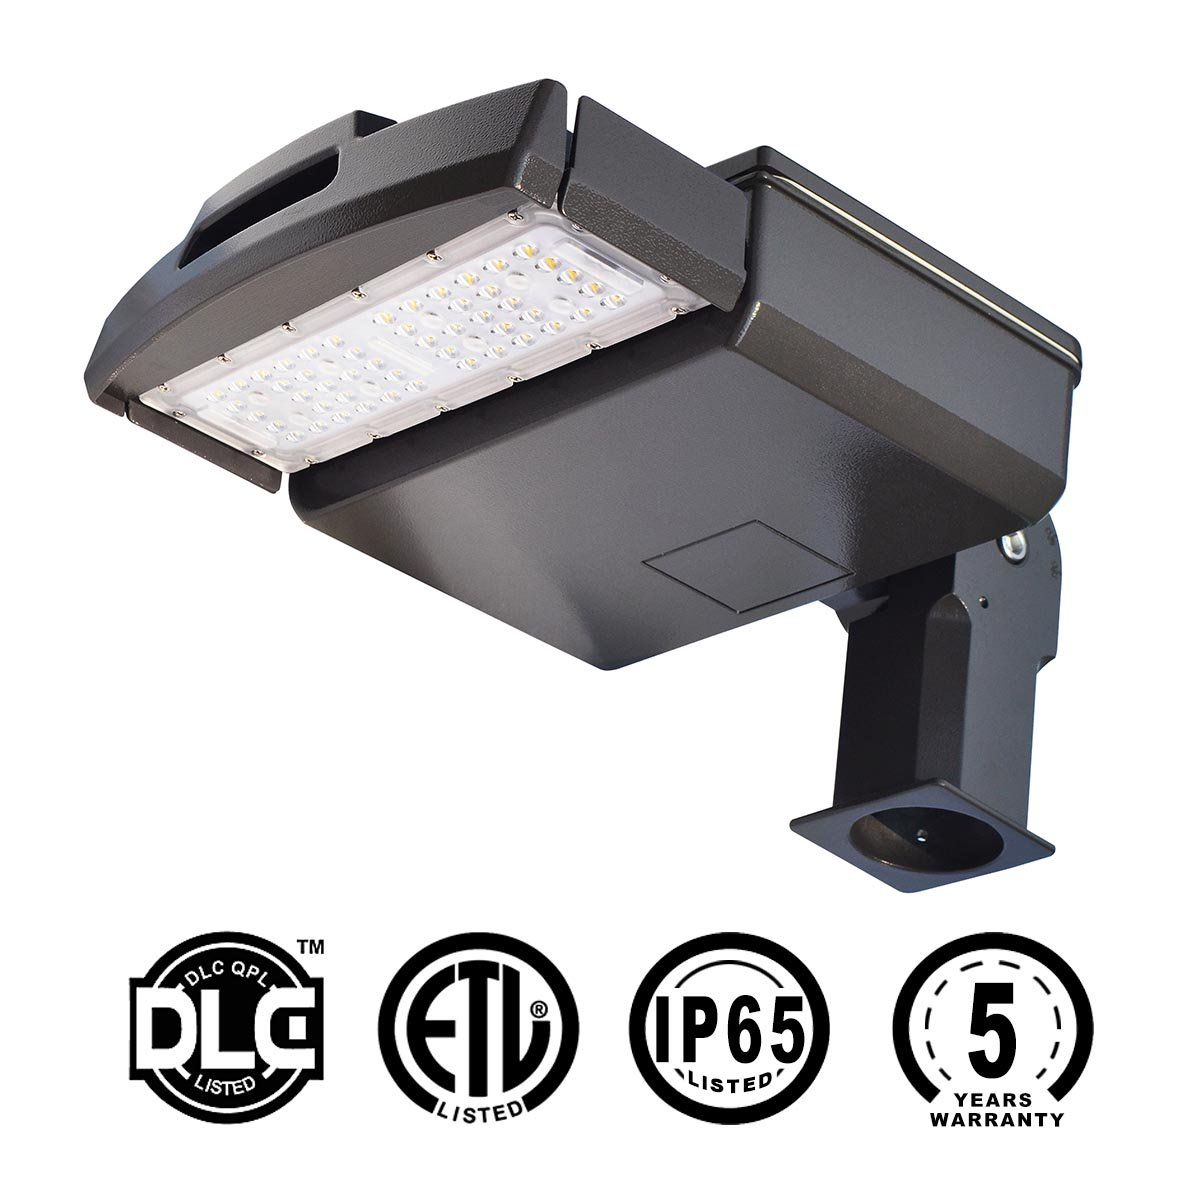 KAWELL 50 W Shoebox Pole Light, Led Parking Lot Light, Commercial Grade Outdoor Site Area Led Street Light 5500 LM 4800-5300K, ROHS,CE,ETL,DLC Listed, 5 Years Warranty